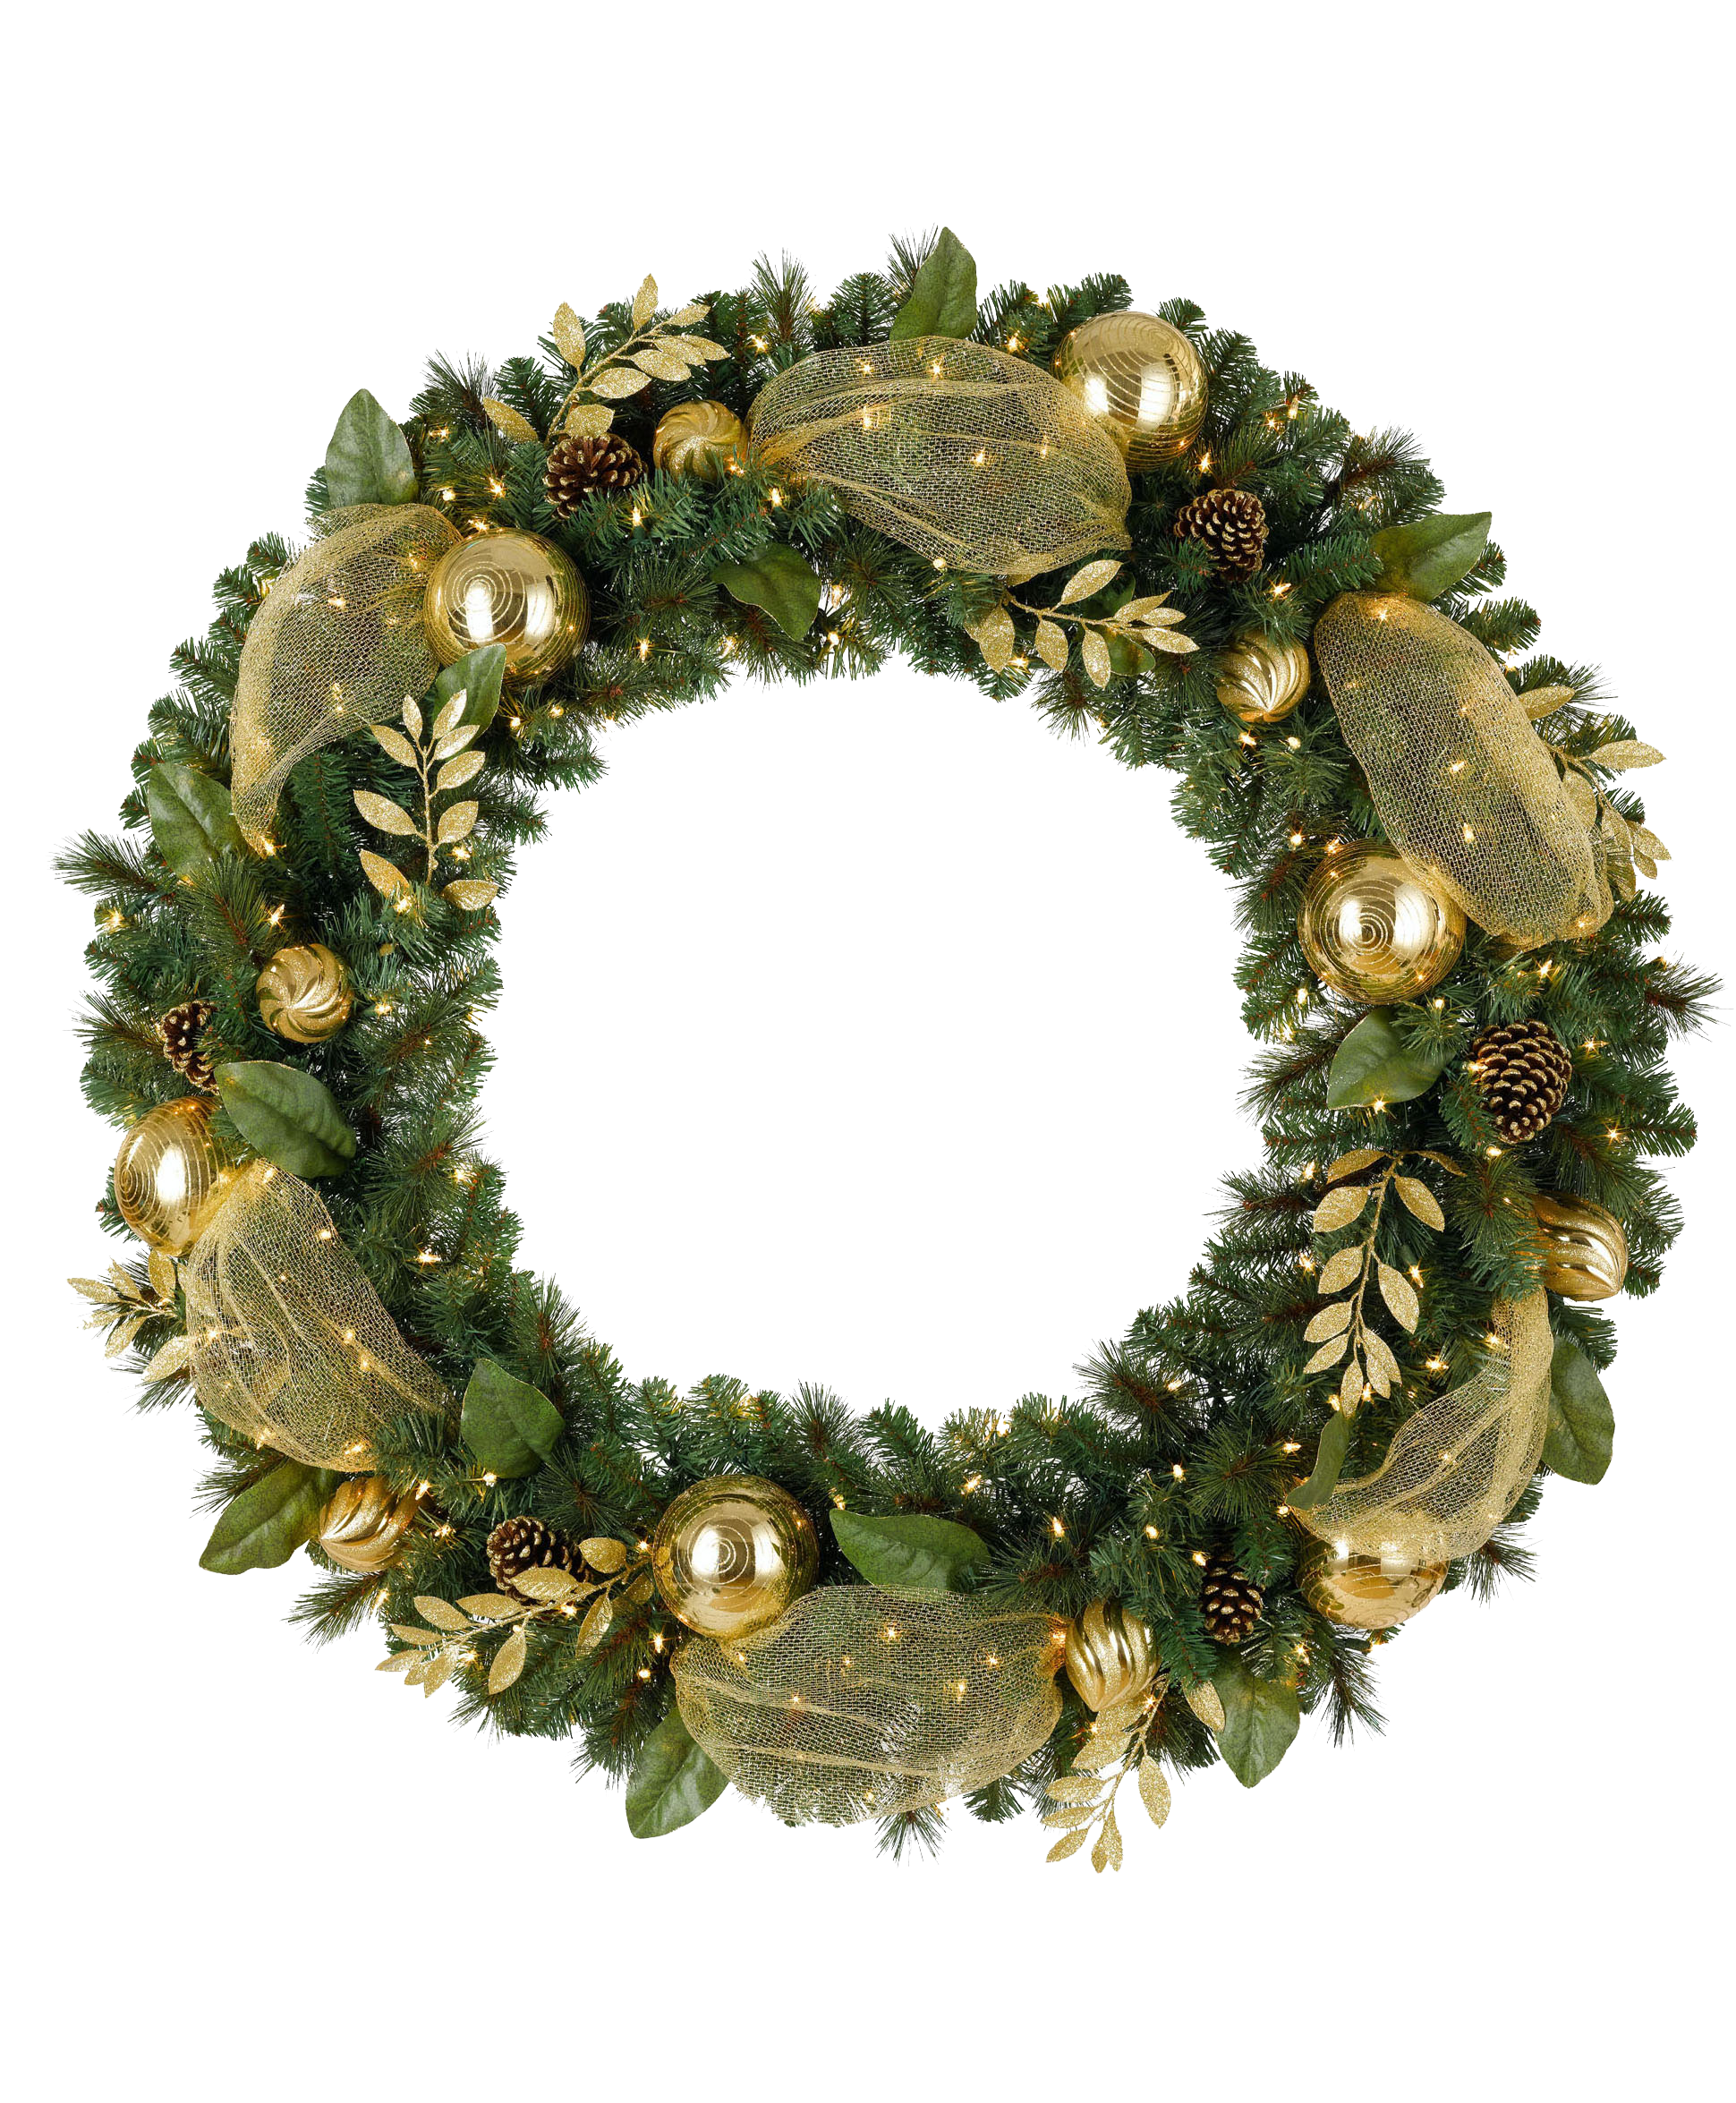 Christmas Reef Png.Download Christmas Wreath Hd Hq Png Image Freepngimg